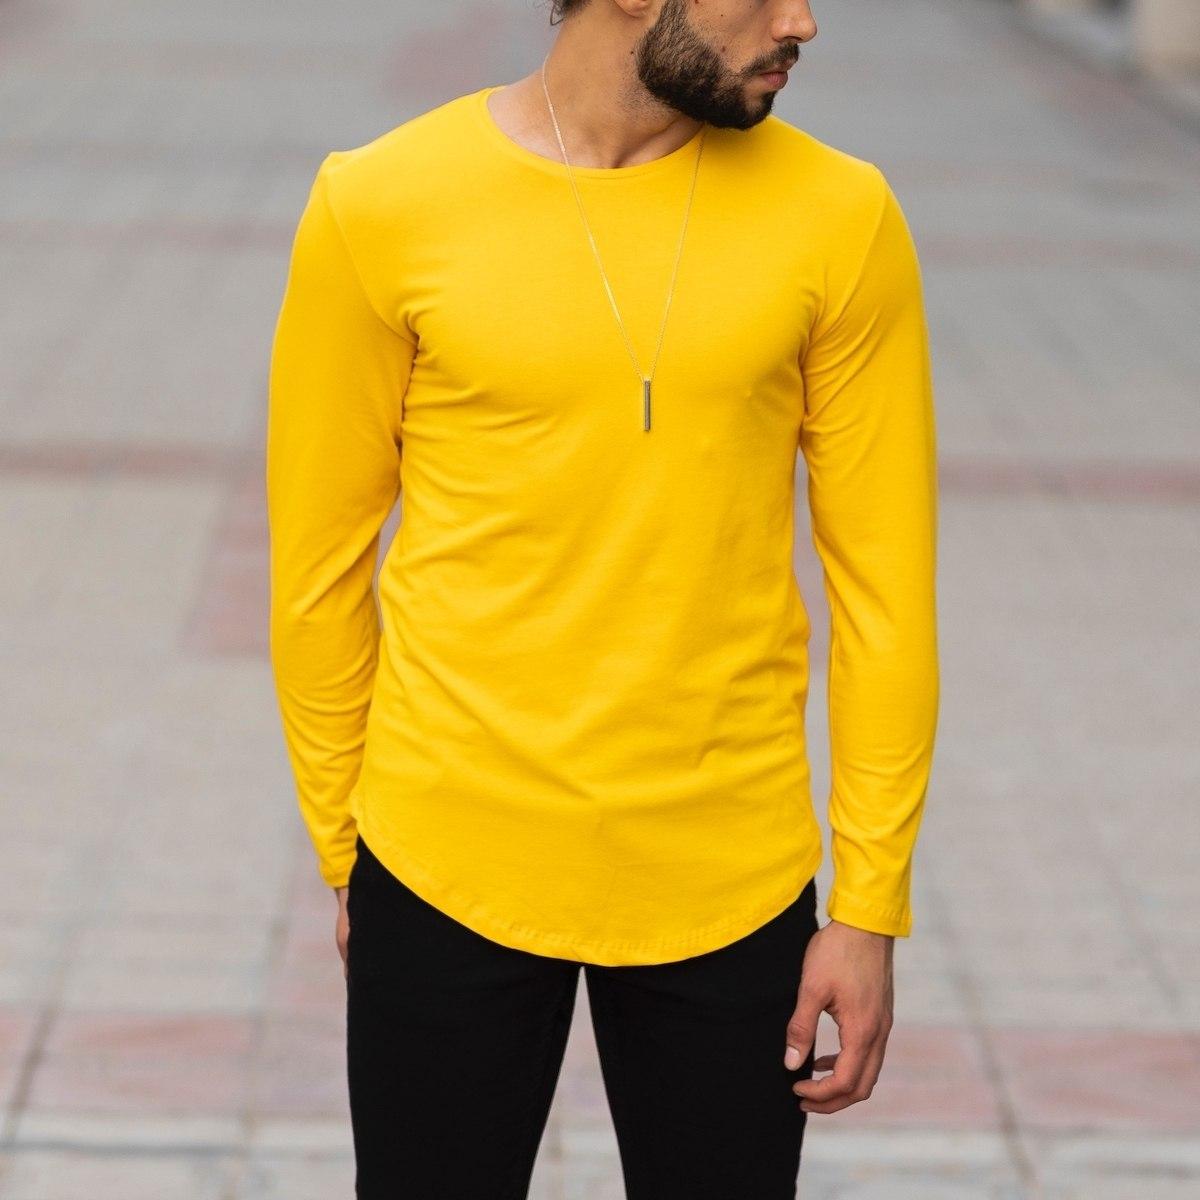 Basic Sweatshirt In Yellow